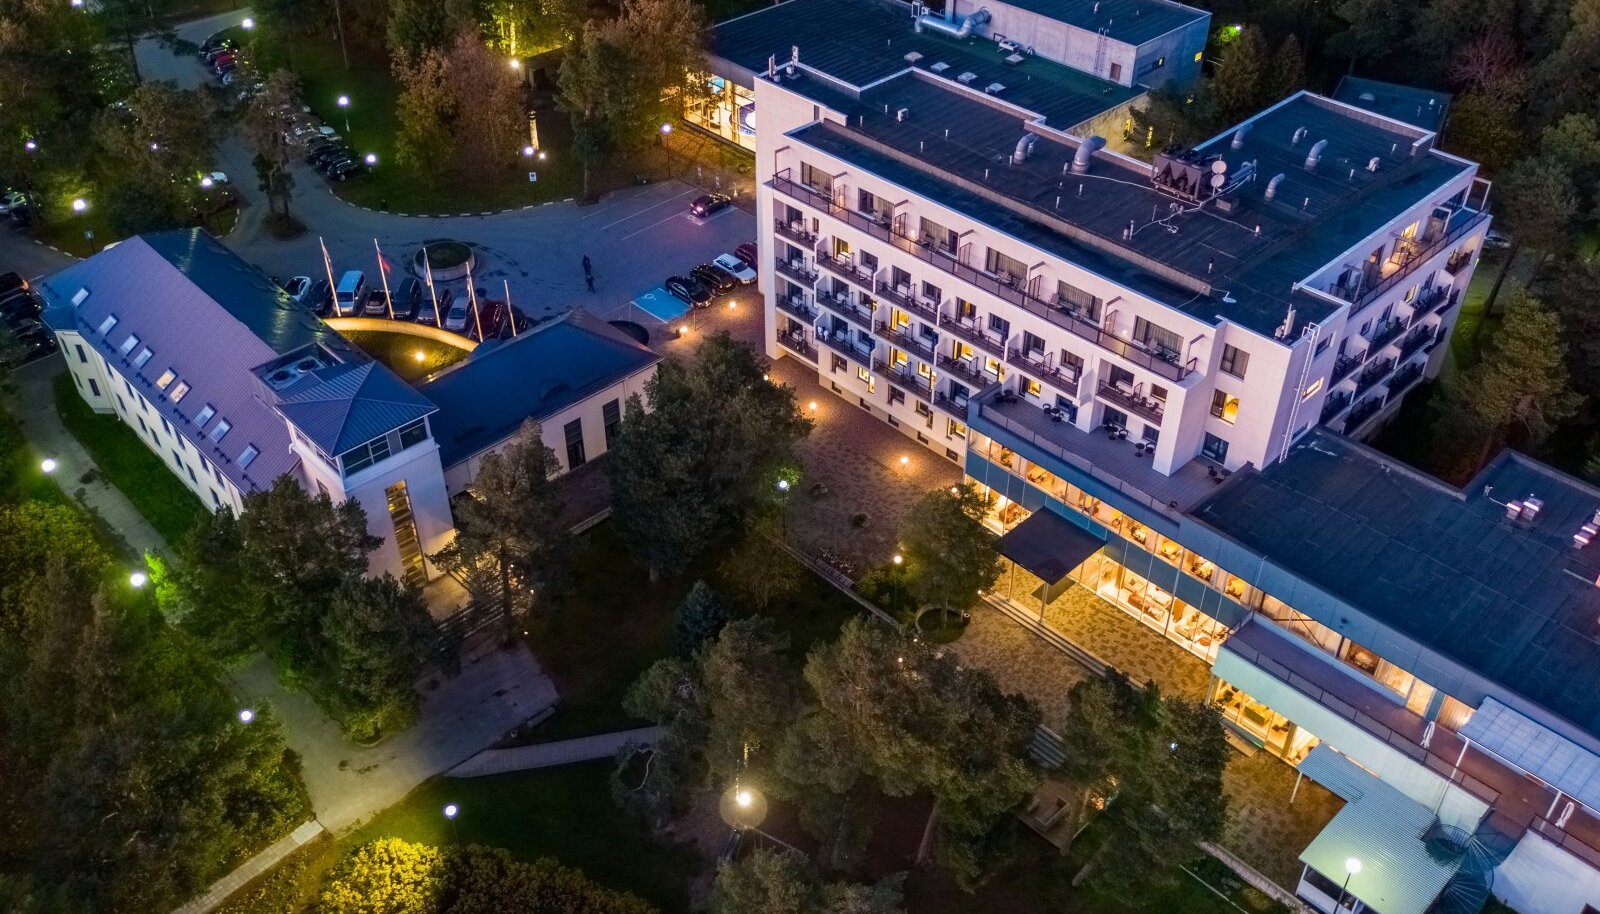 Hestia Hotel Laulasmaa